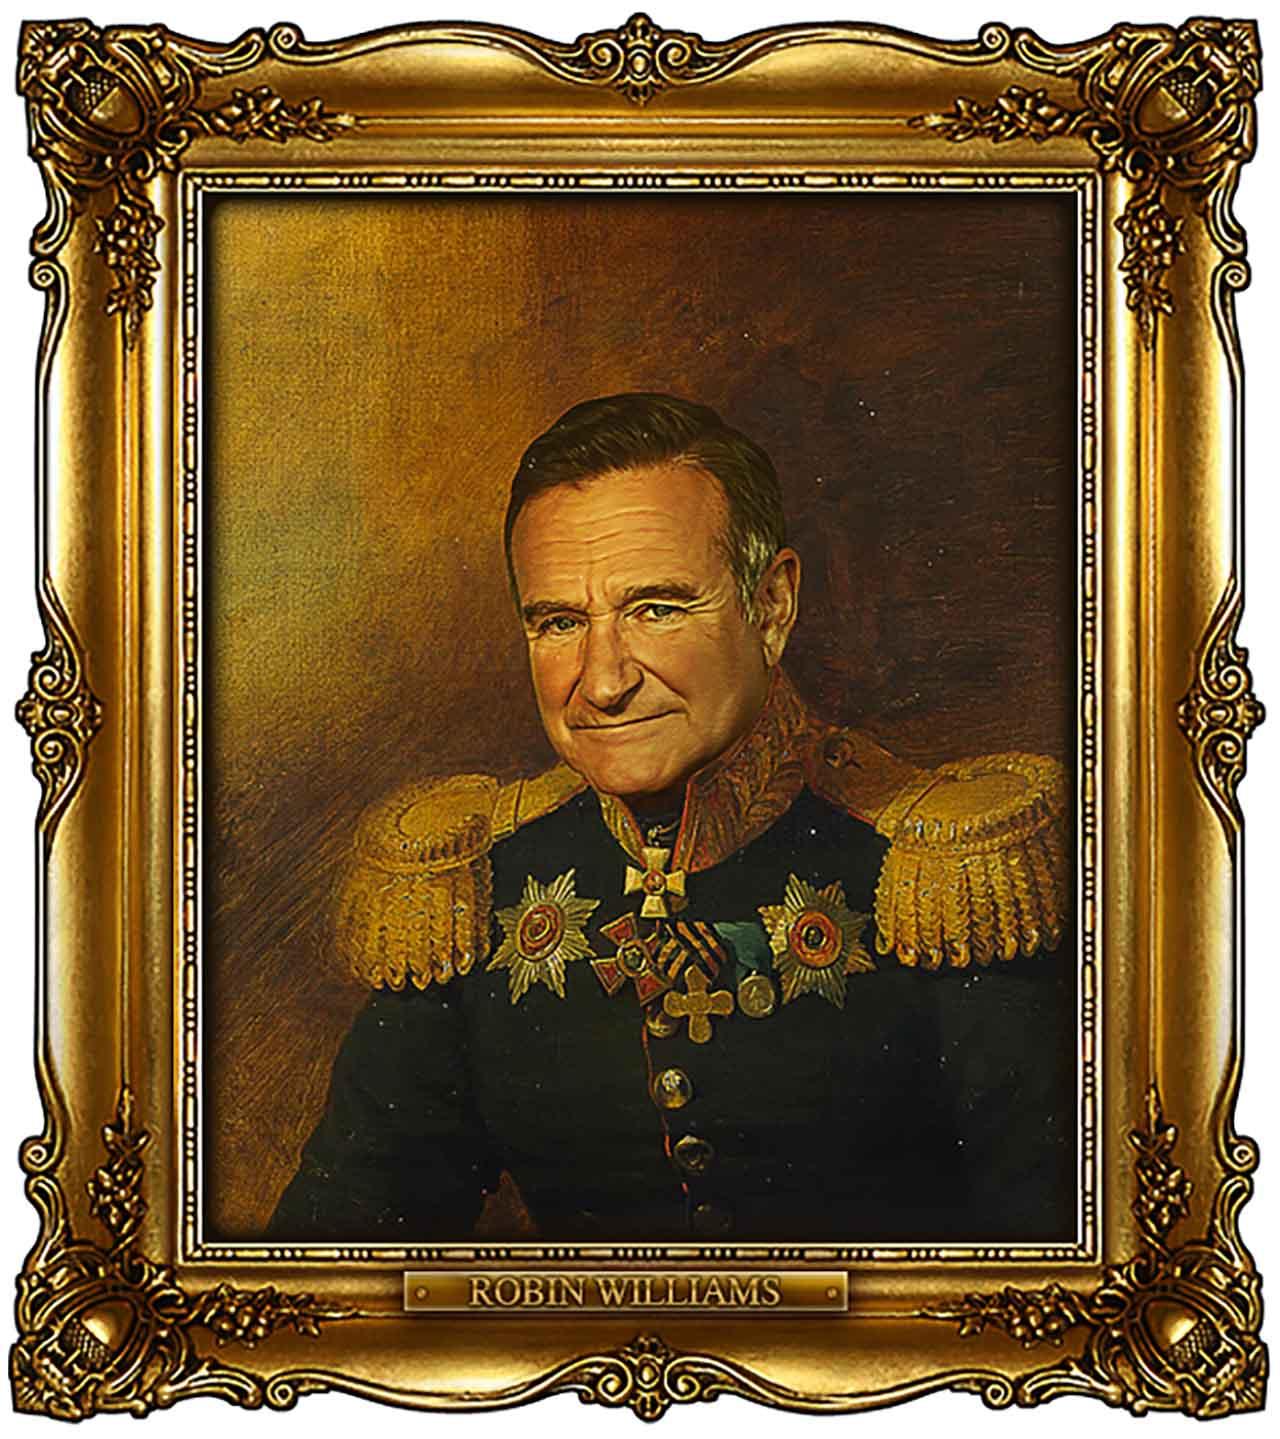 Artist Turns Famous Actors Into Russian Generals - Robin Williams